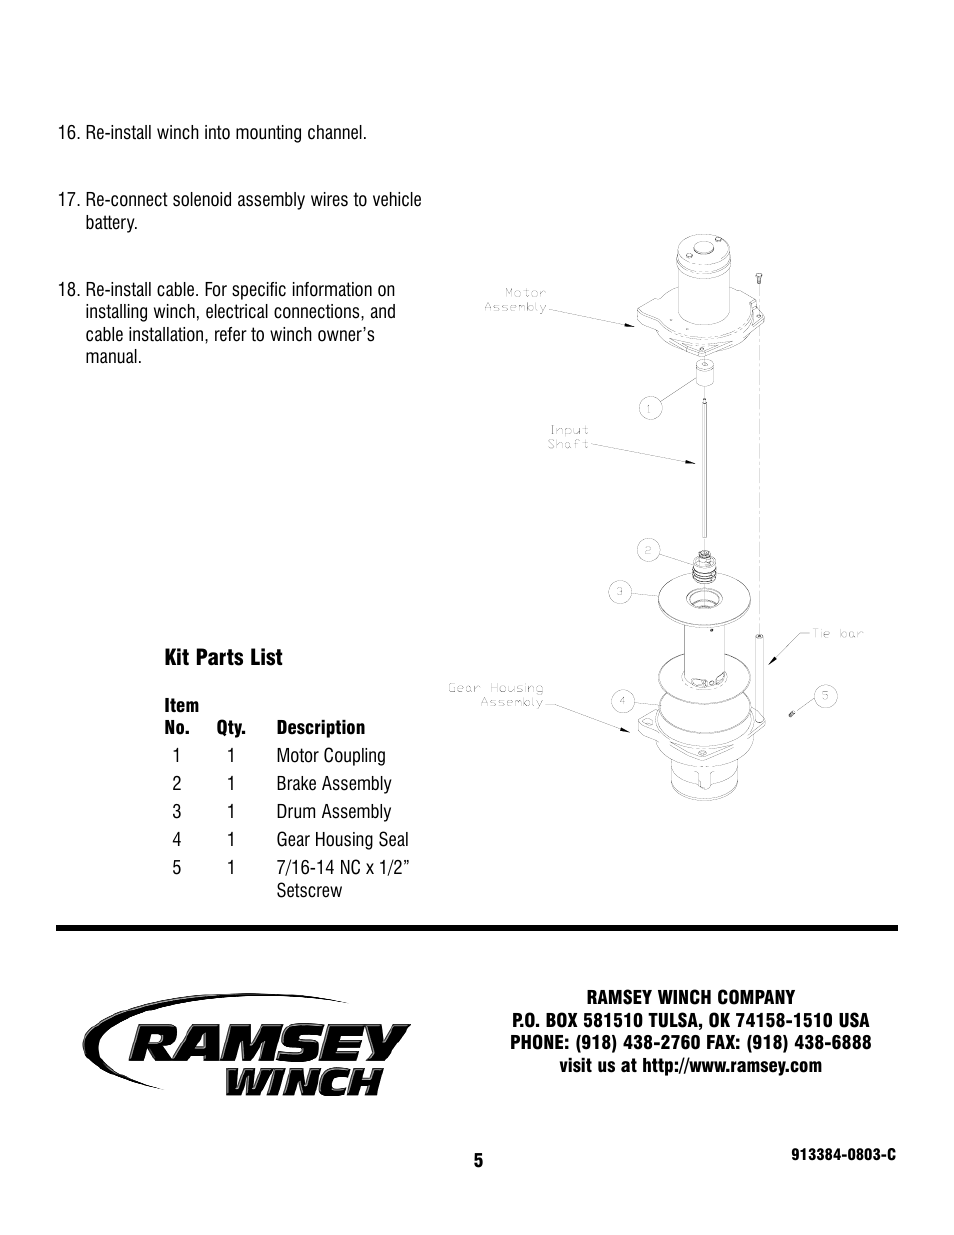 Ramsey Winch PATRIOT 15000 KE REPLACEMENT KIT 251252 User ... on